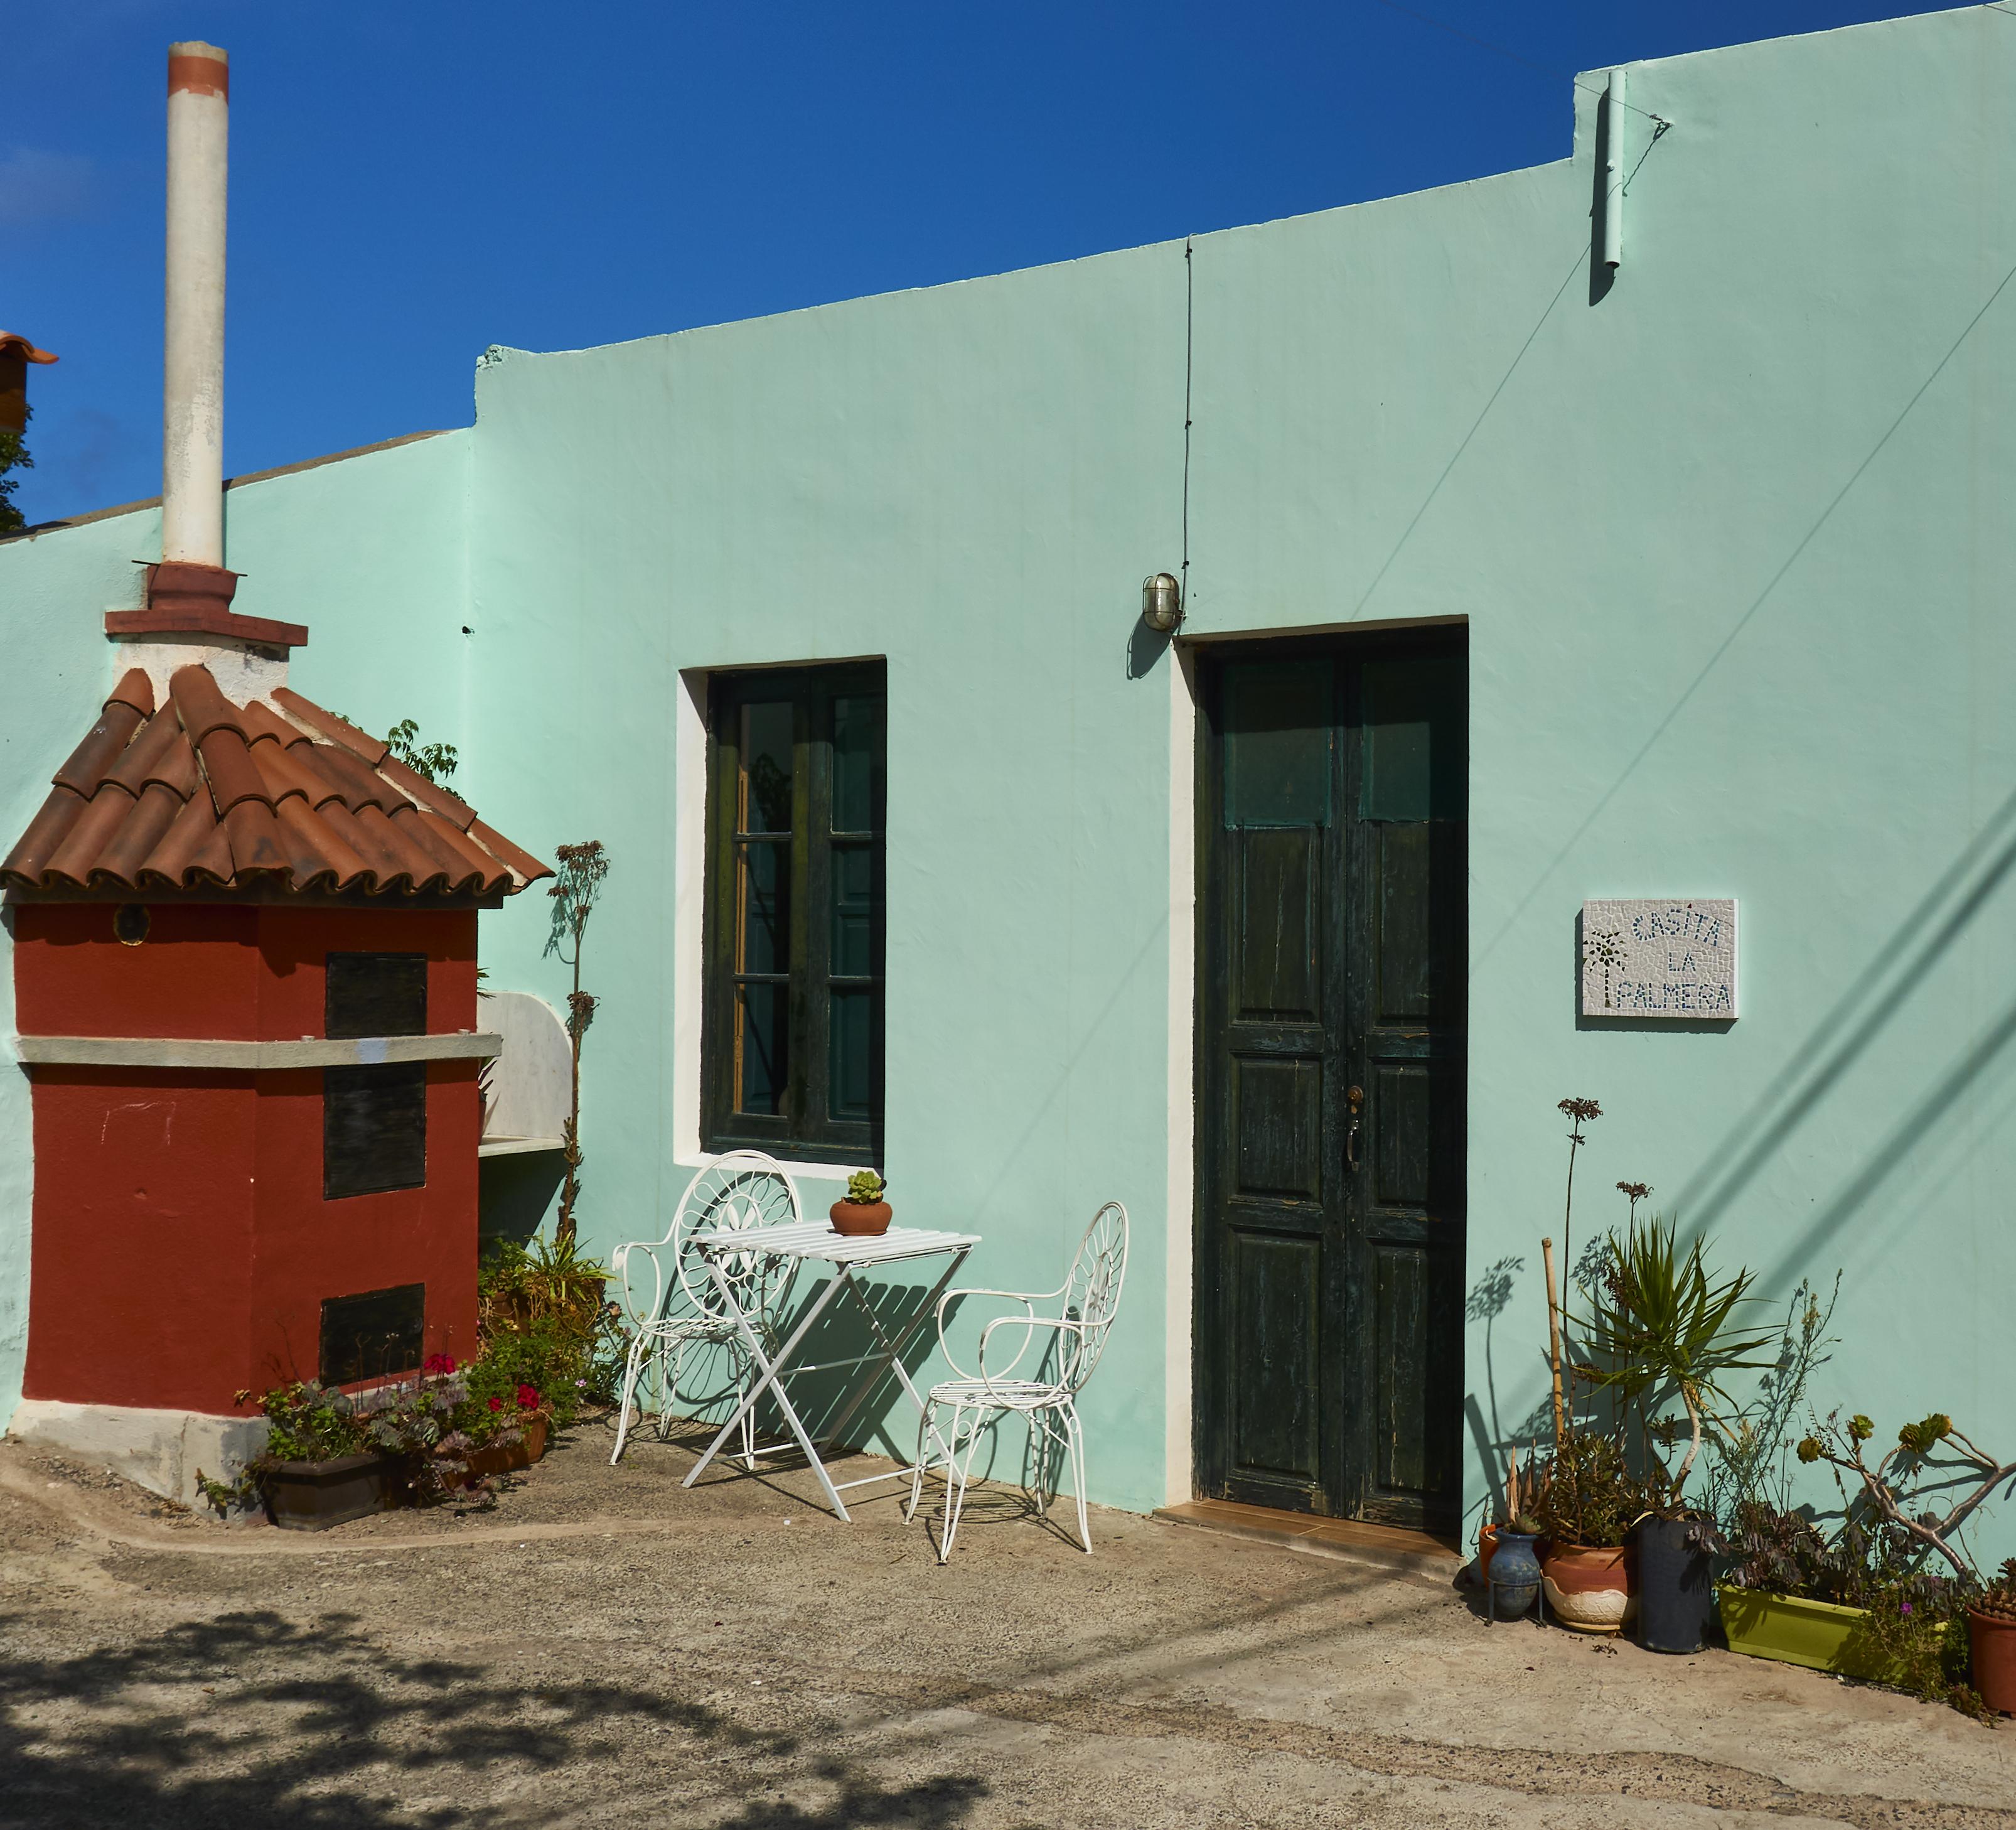 Fotos Gratis Casa Parilla Fuera De Terraza Azul